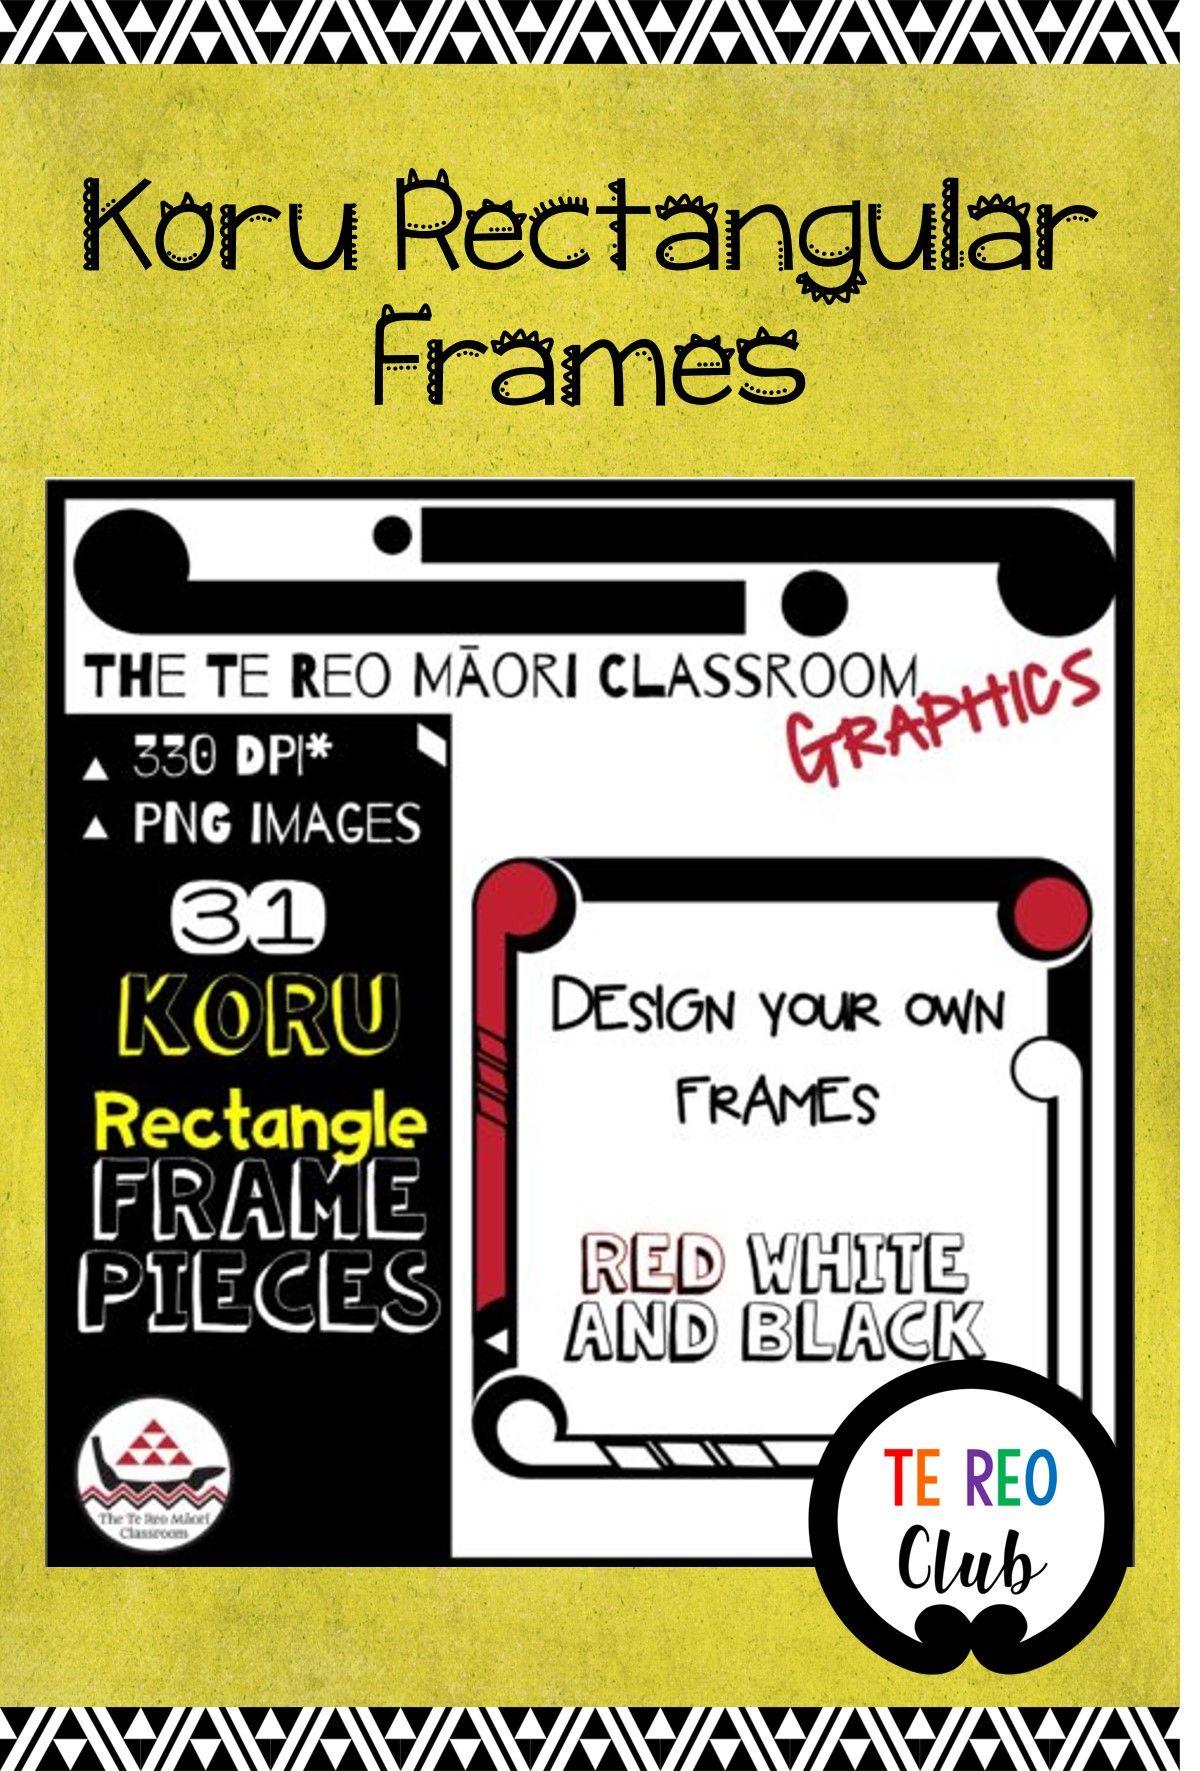 Diy Koru Rectangular Frames In